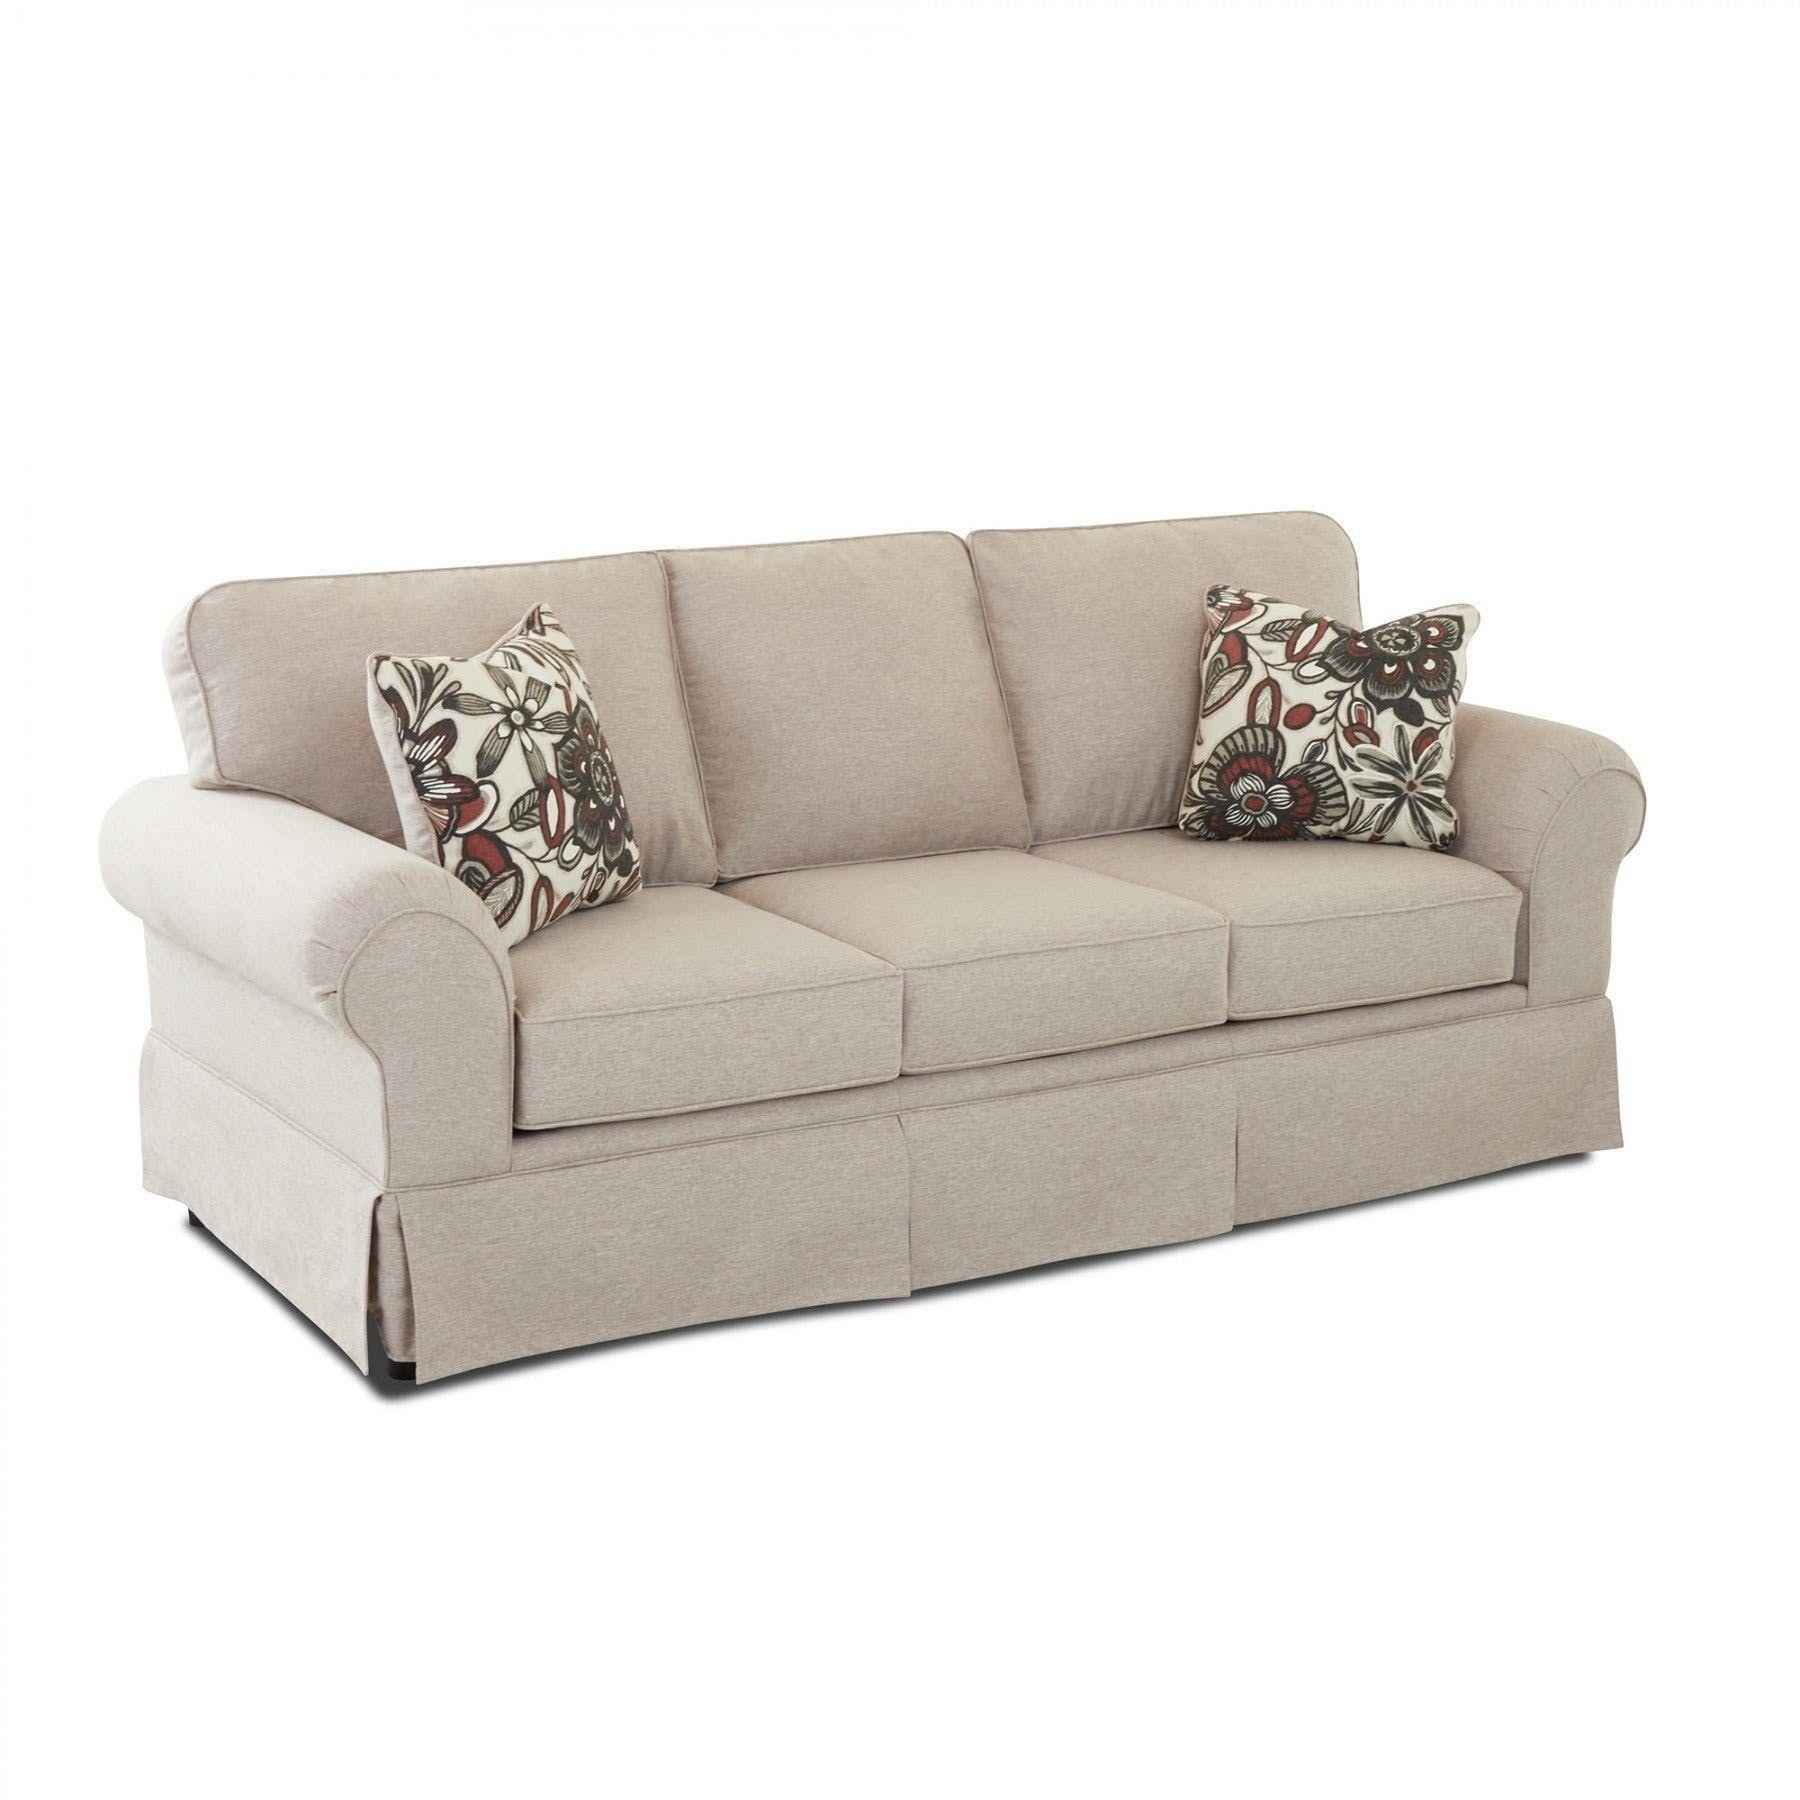 Woodwin Sofa Sofas Living Room Bernie Phyl S Furniture